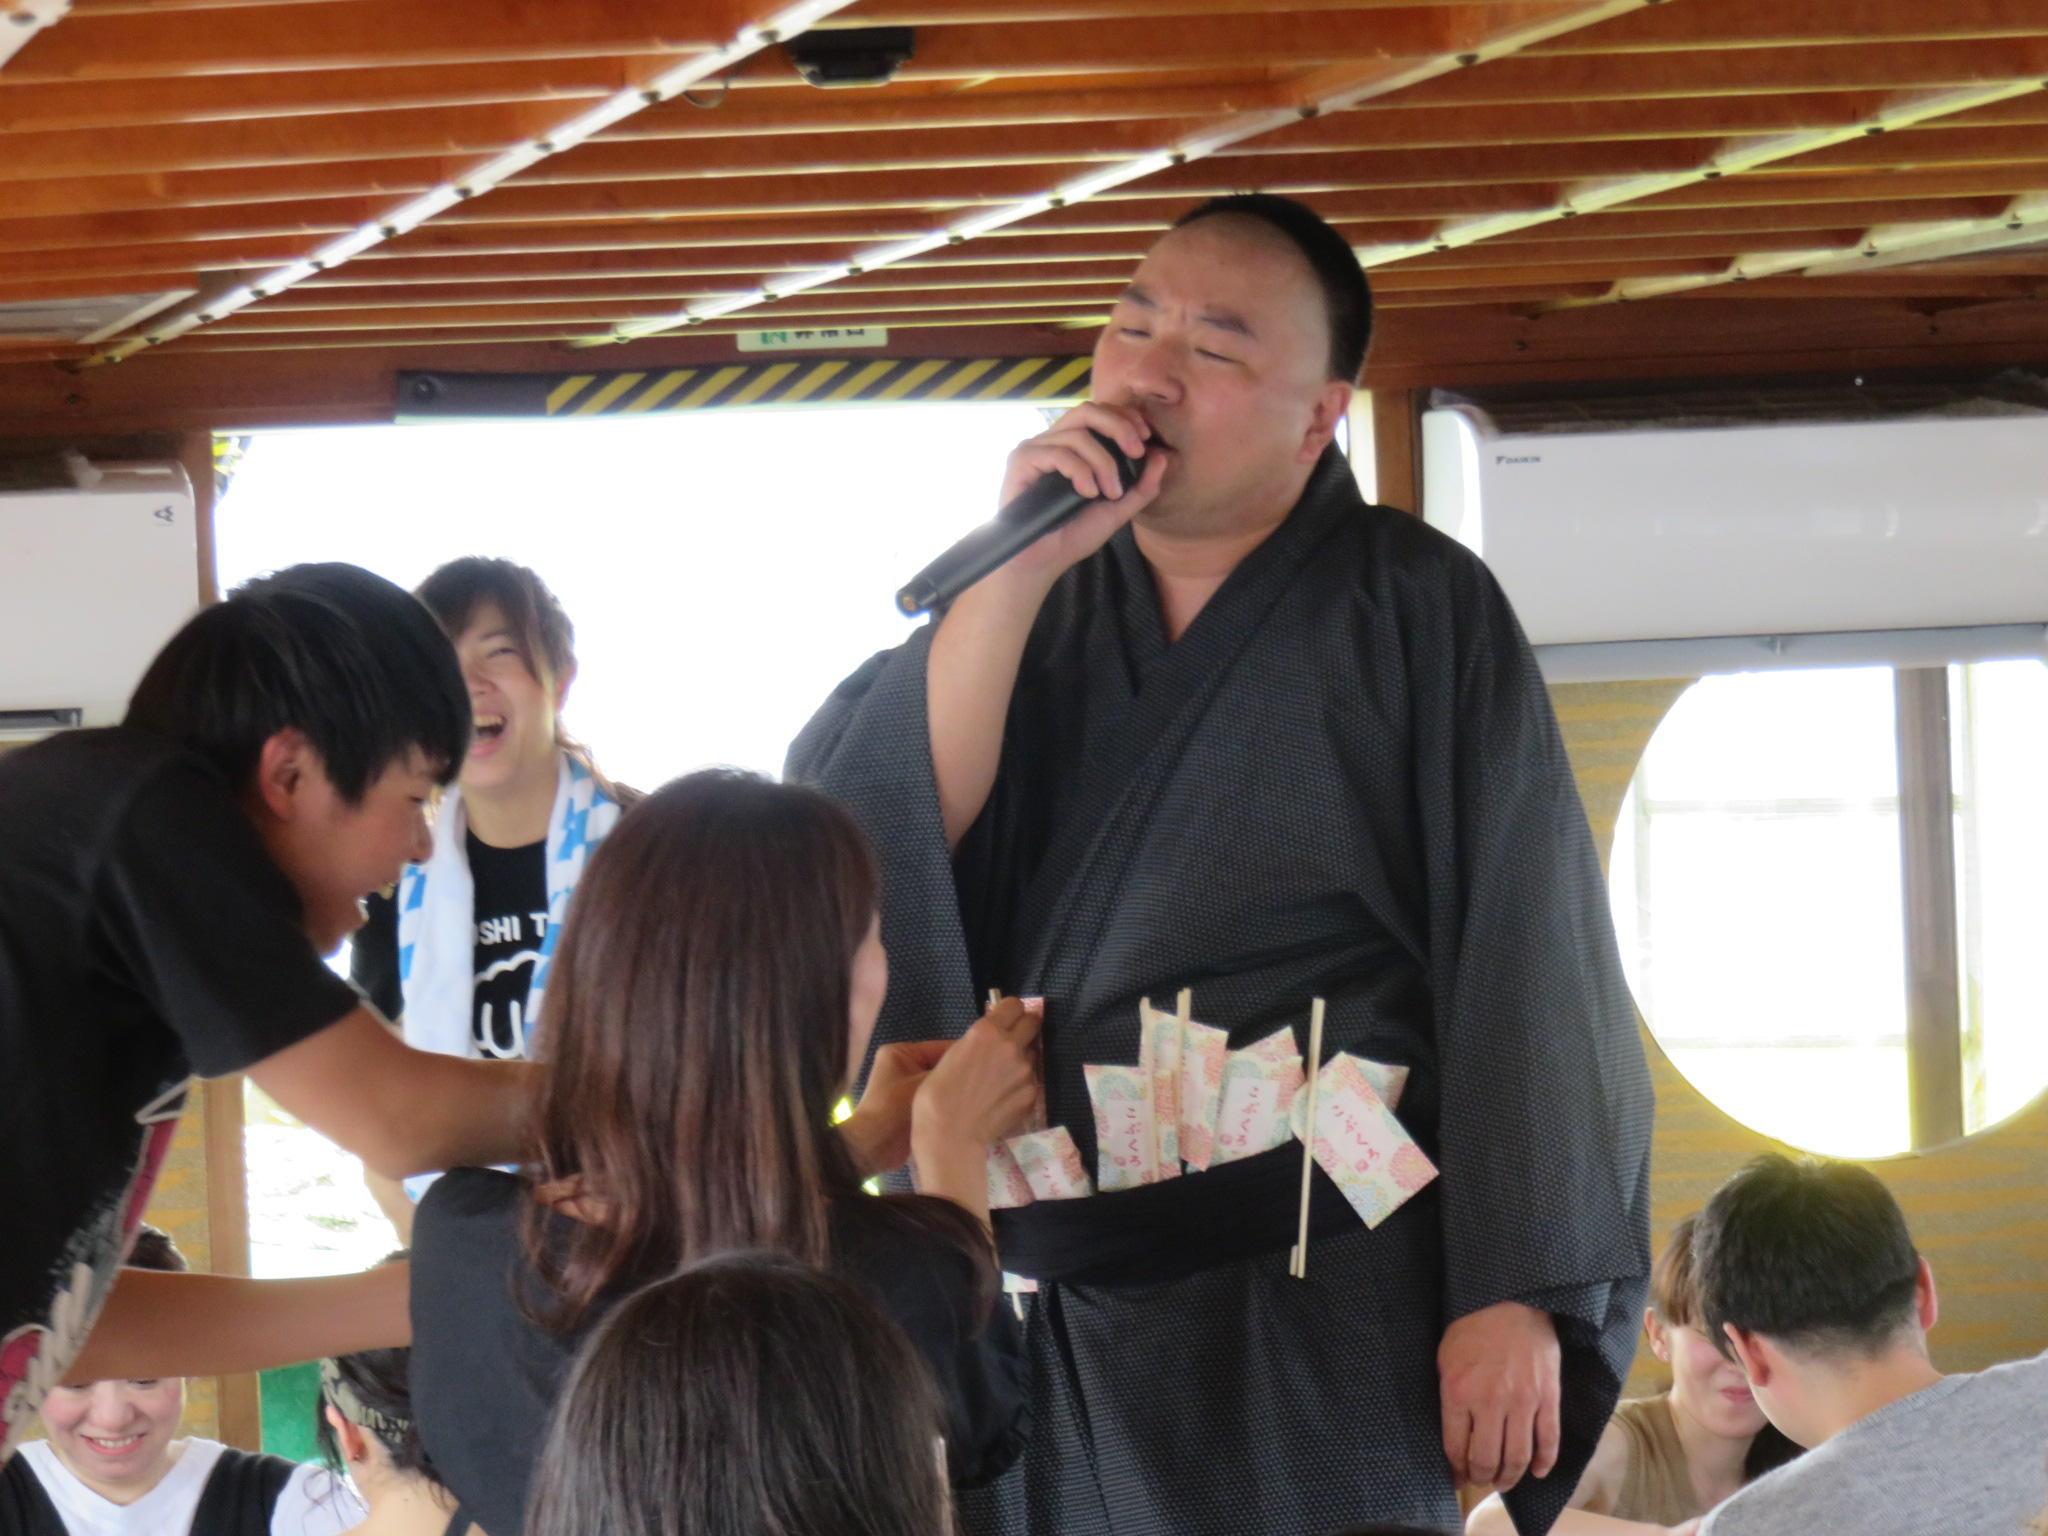 http://news.yoshimoto.co.jp/20170807130100-8ee87d1b9b6d9e03ecbeeae389d5e638422b64f0.jpg